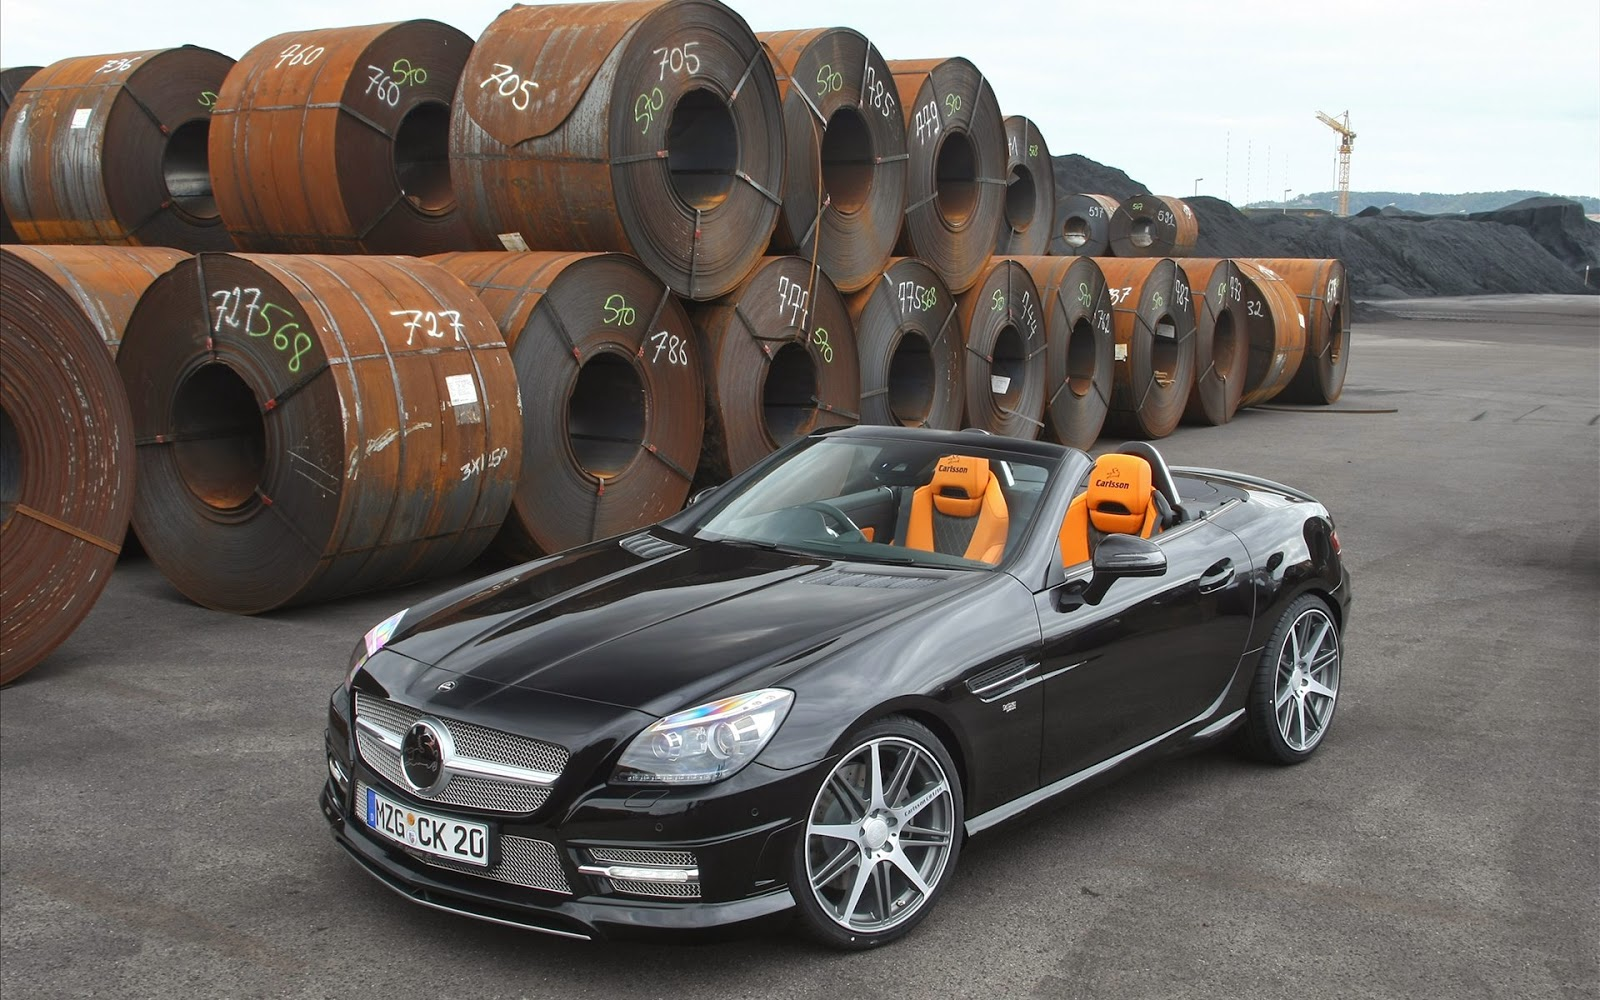 http://www.autocarsinfo.com/2014/09/carlsson-rs-mercedes-benz-slk-free.html